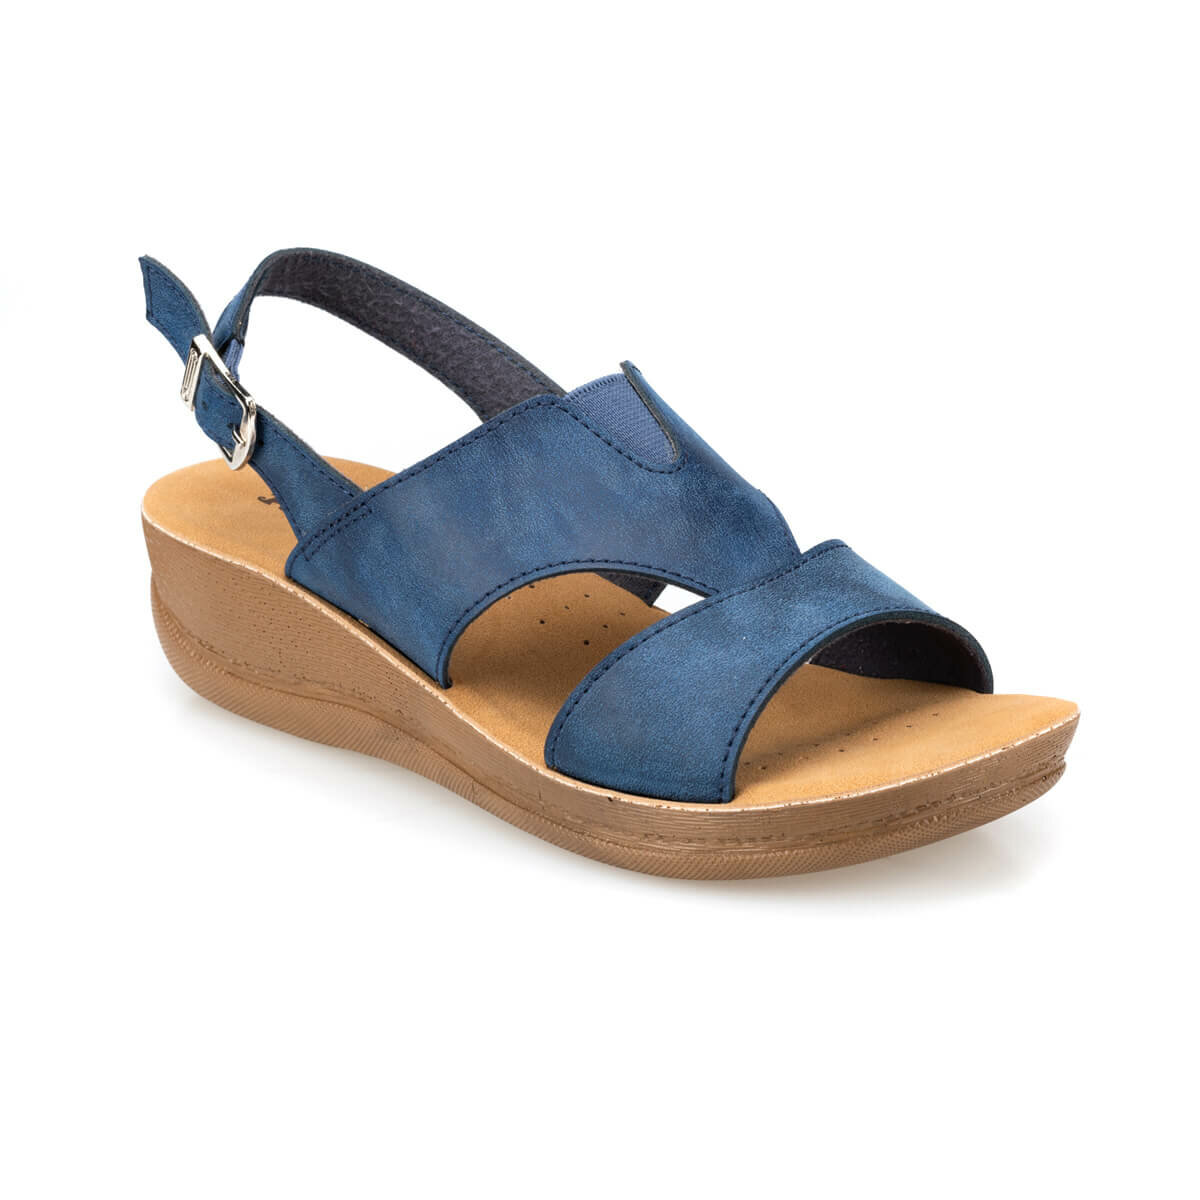 FLO 91.150764.Z Navy Blue Women Sandals Polaris